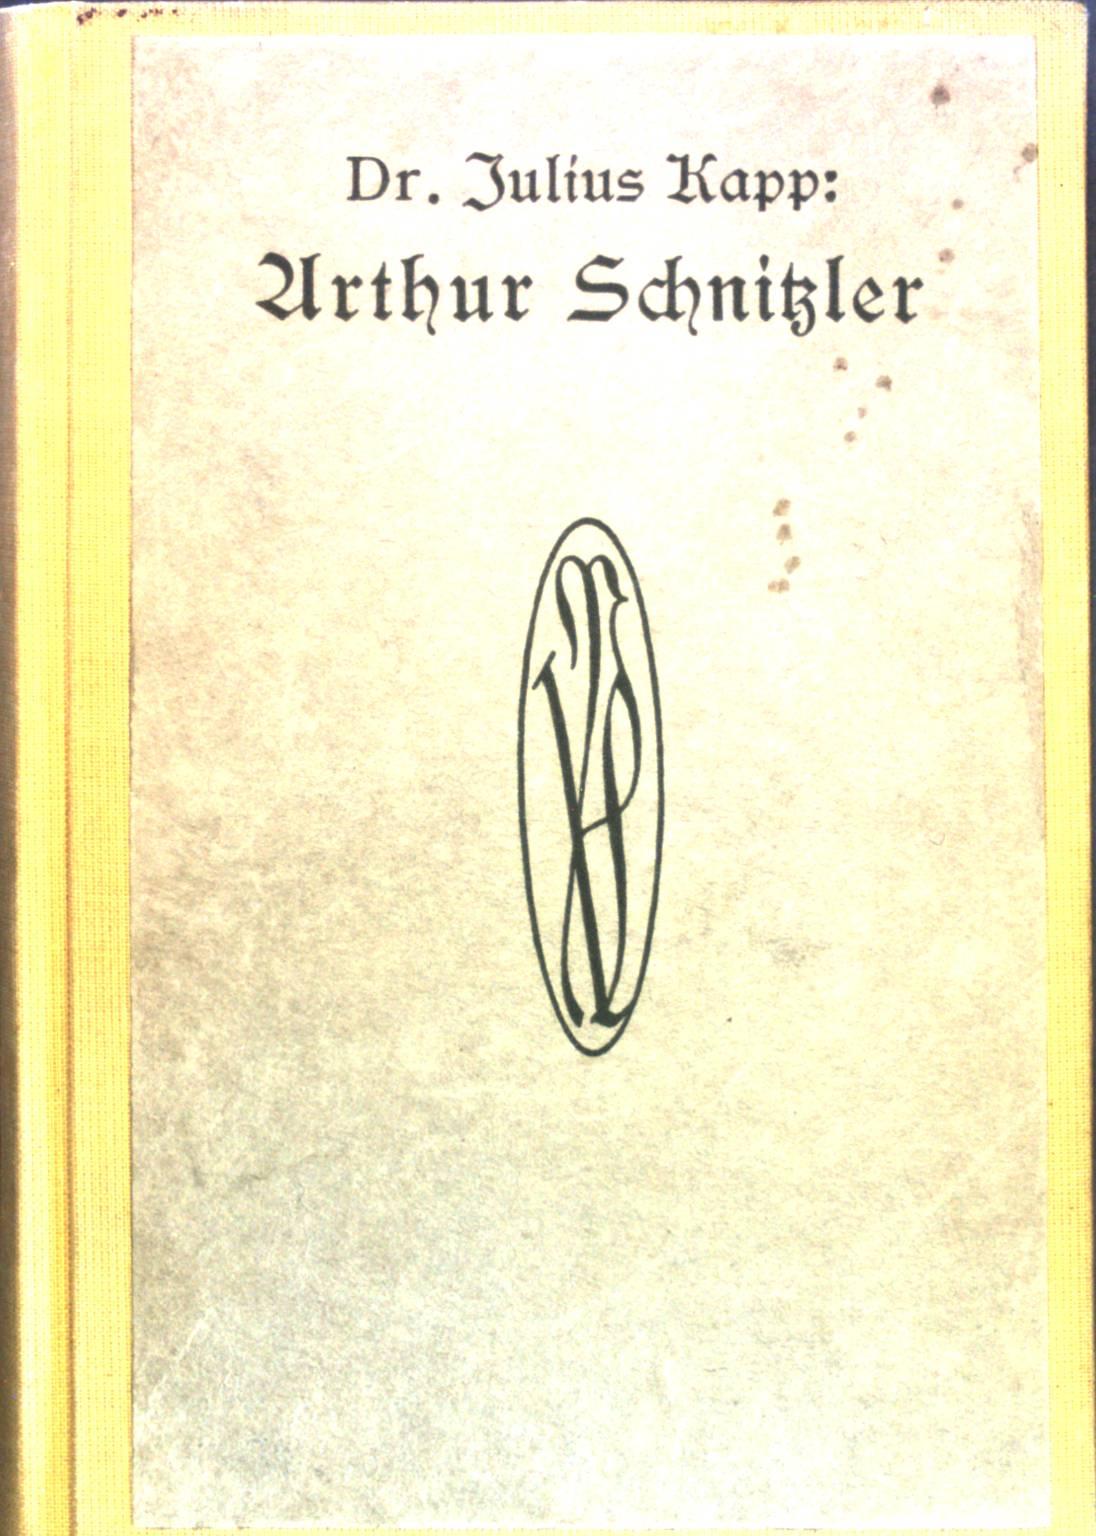 Arthur Schnitzler.: Kapp, Julius: